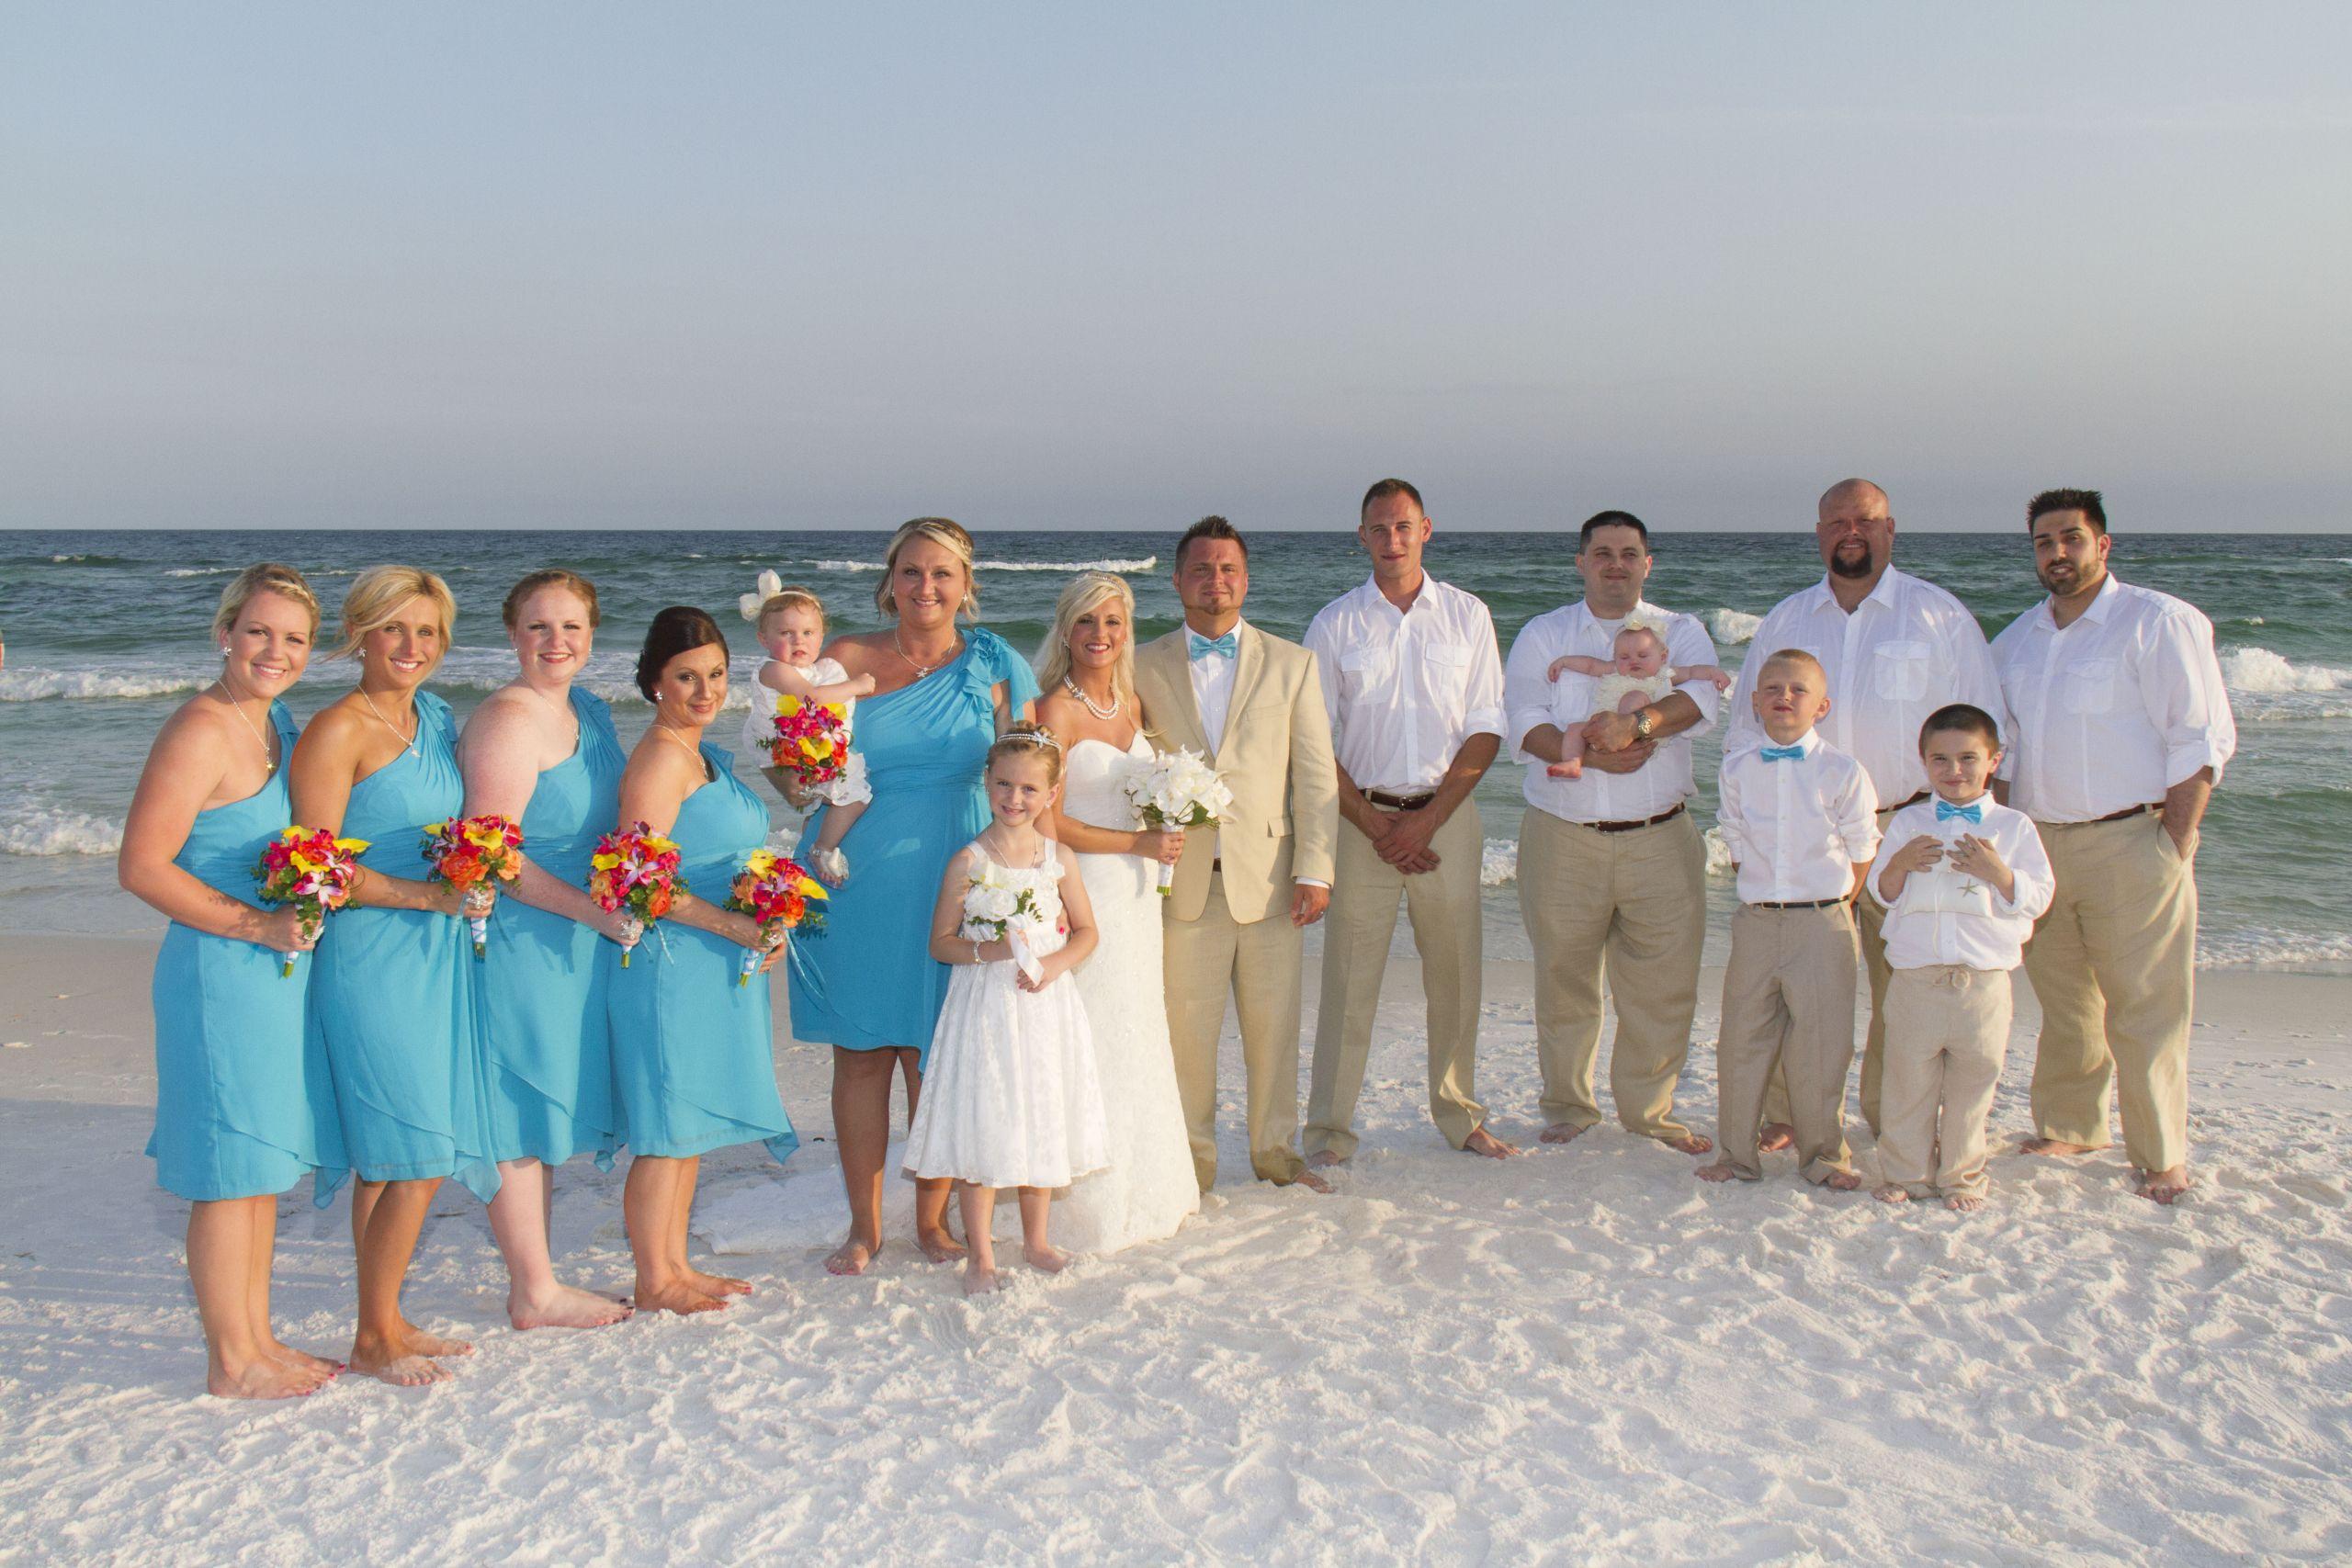 Beach Weddings Florida  Destin Florida Barefoot Beach Wedding – Barefoot Weddings